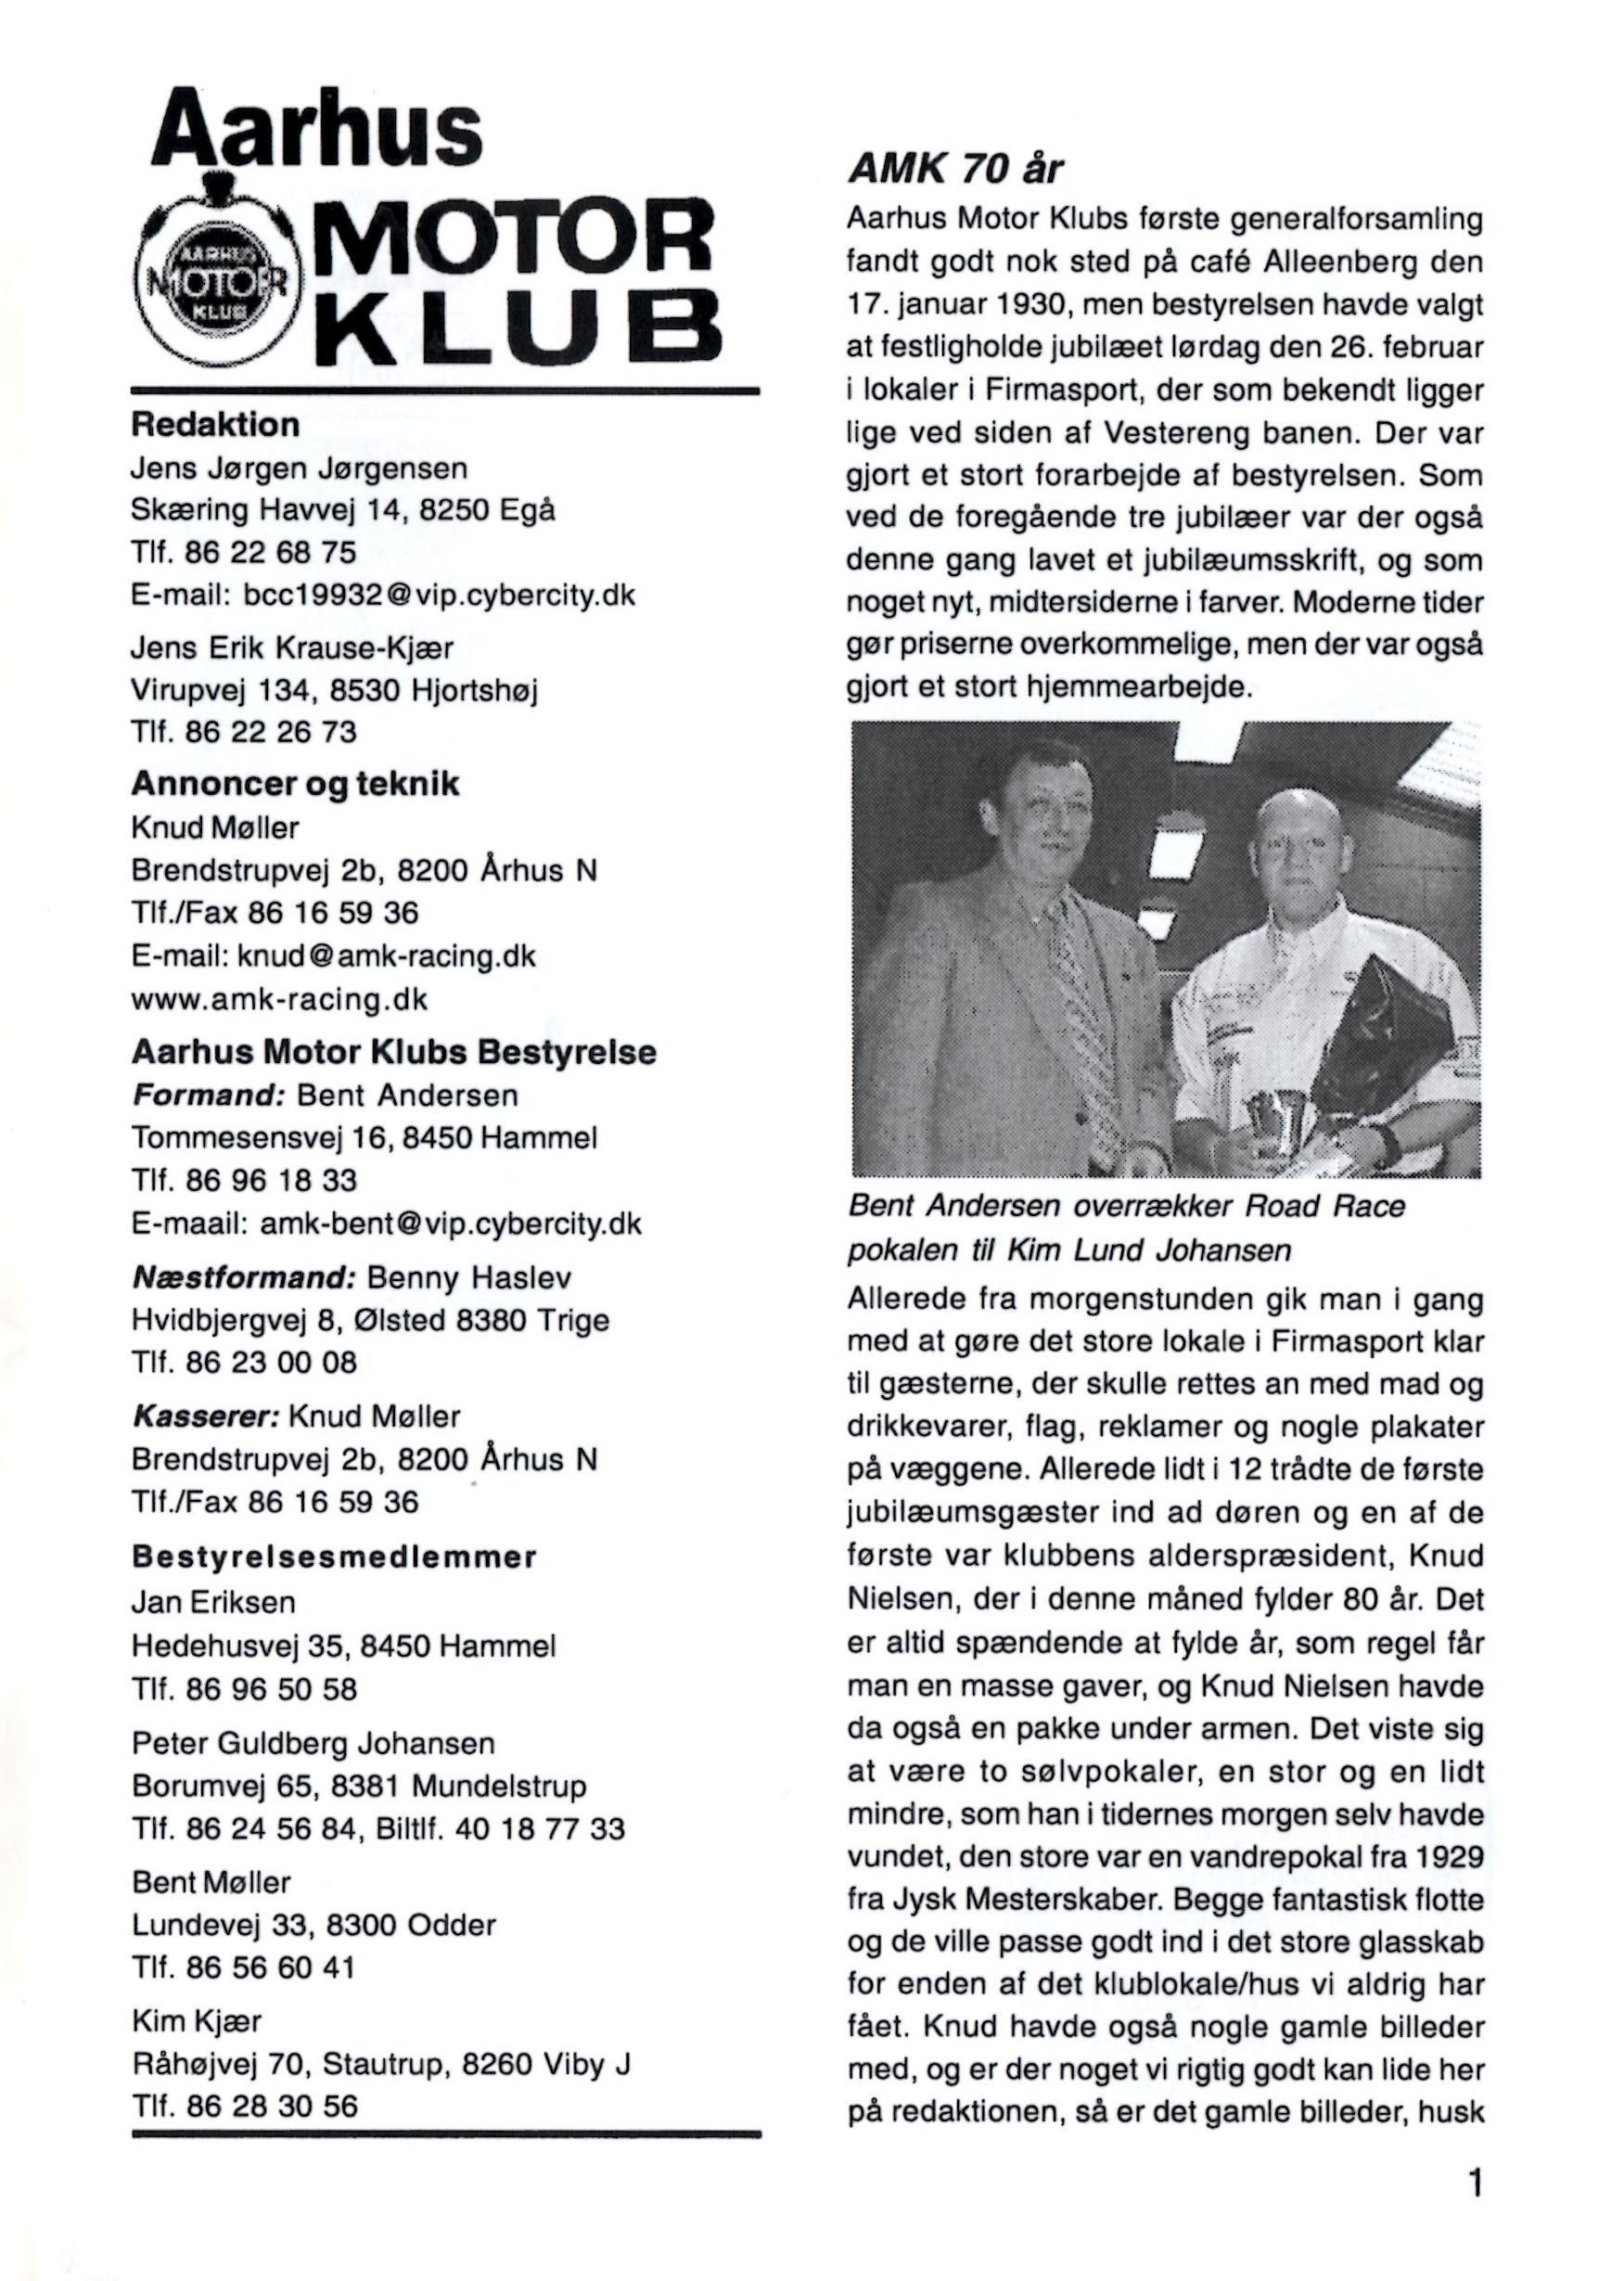 Omtale 1 marts 2000